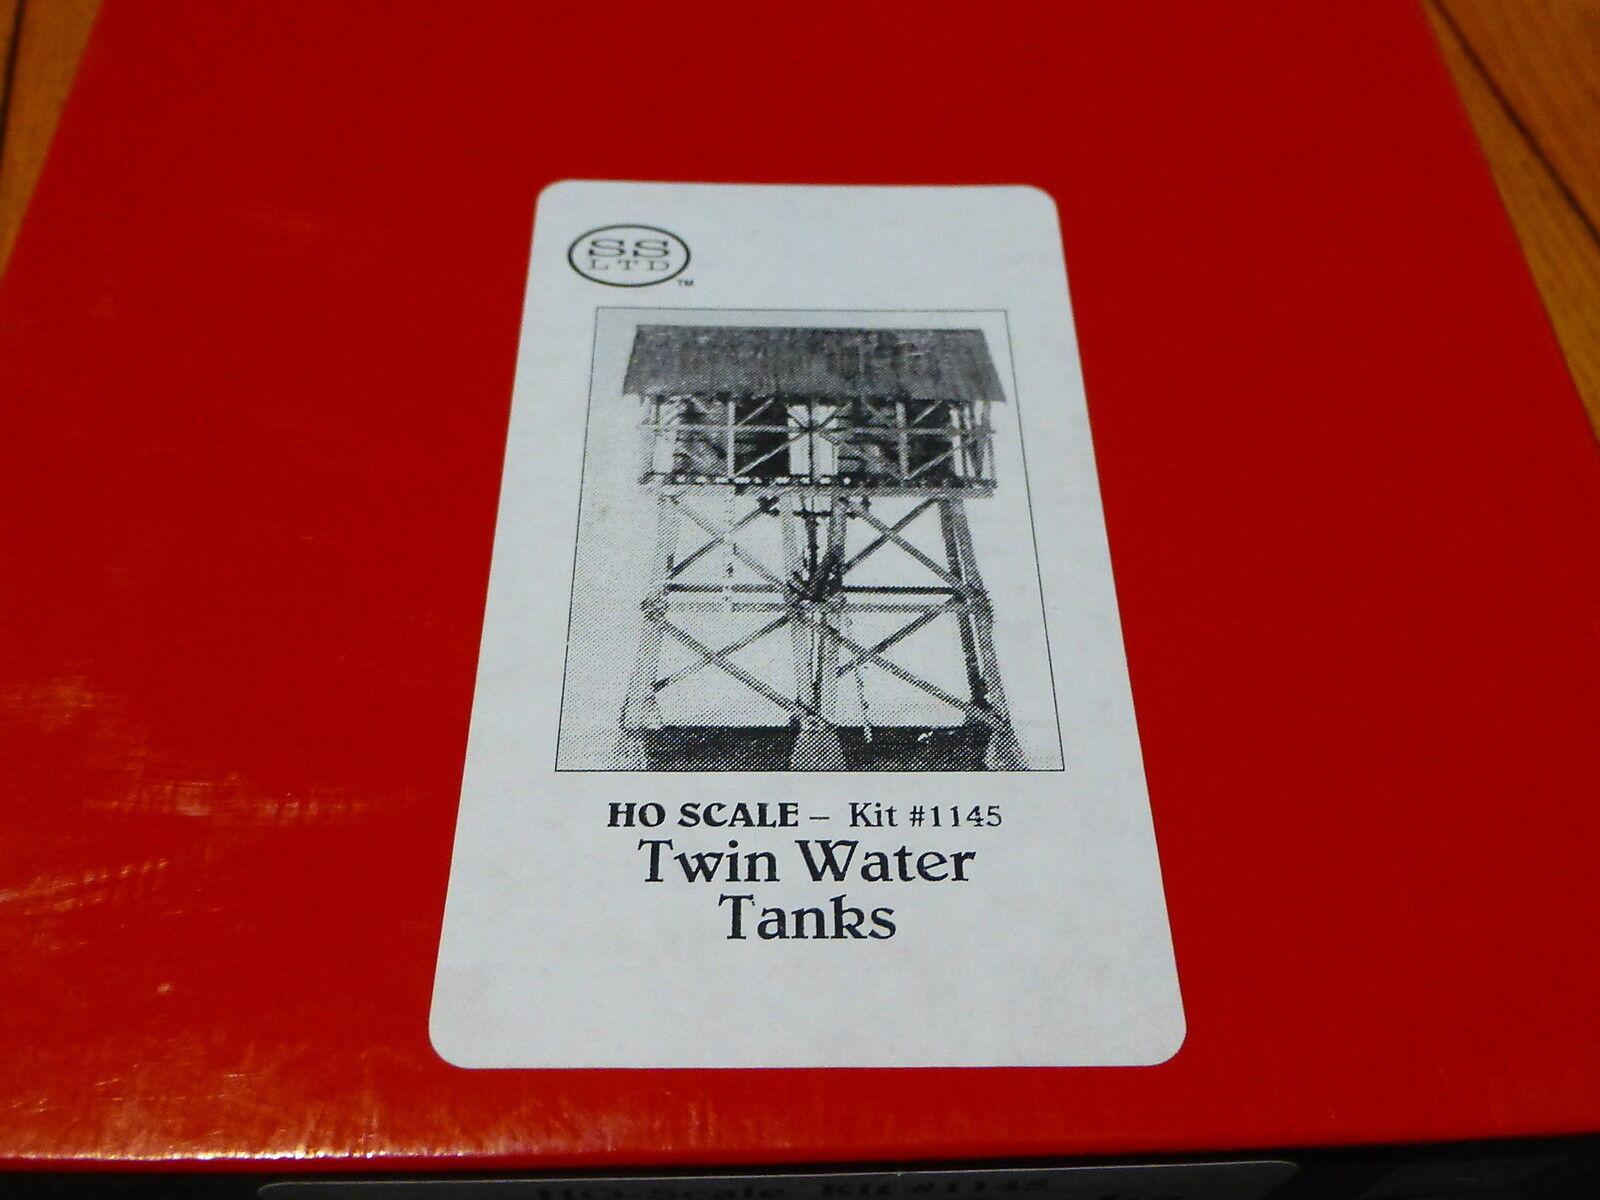 Escala de las estructuras Ltd.   1145 dos tanques de agua -- Kit - 4 X 2-3 4   (forma De Kit)